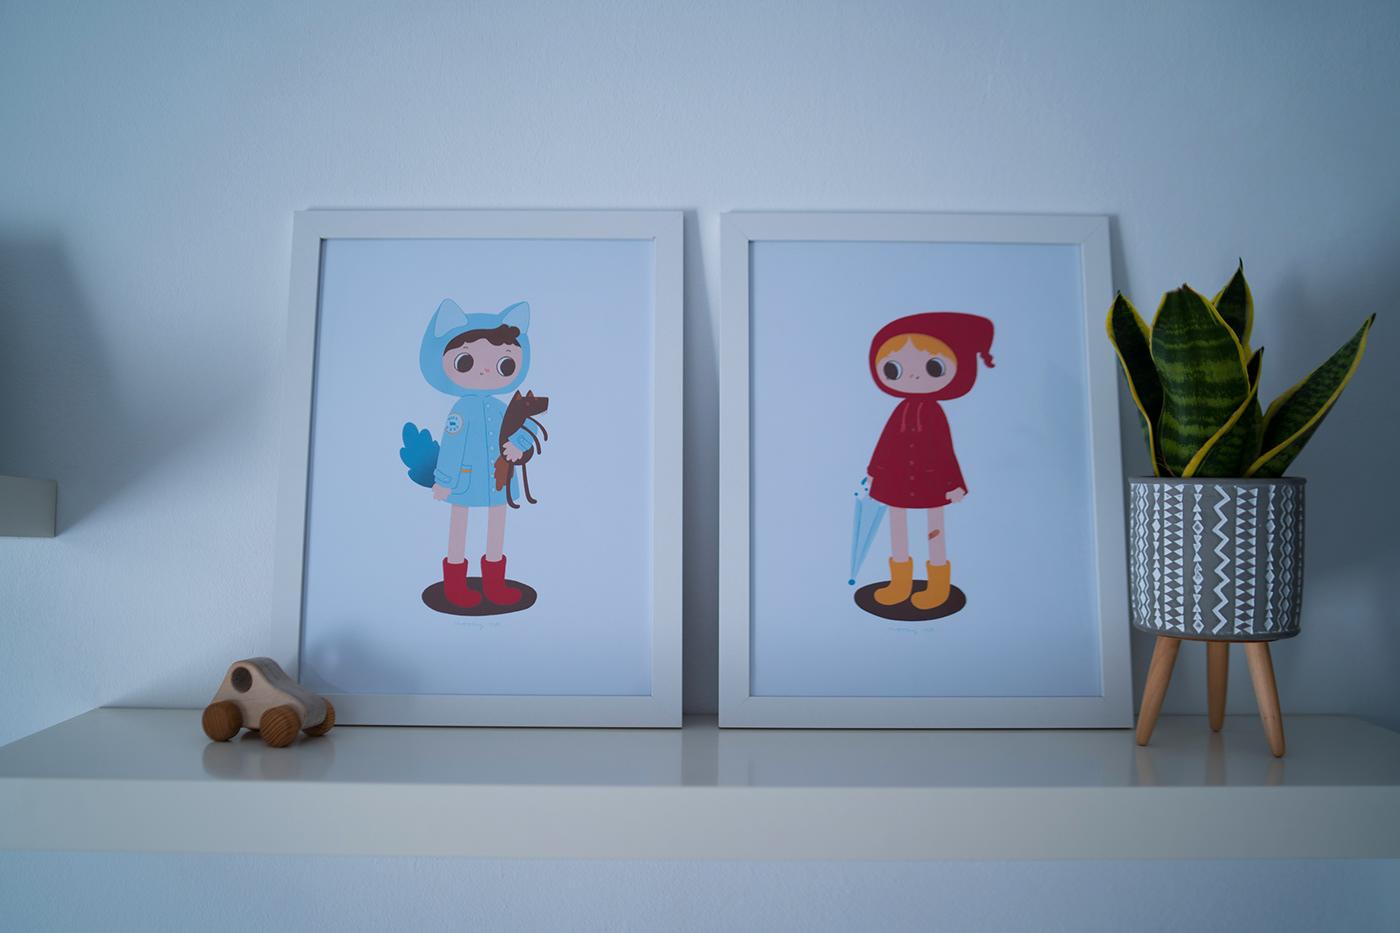 Image may contain: cartoon, wall and child art